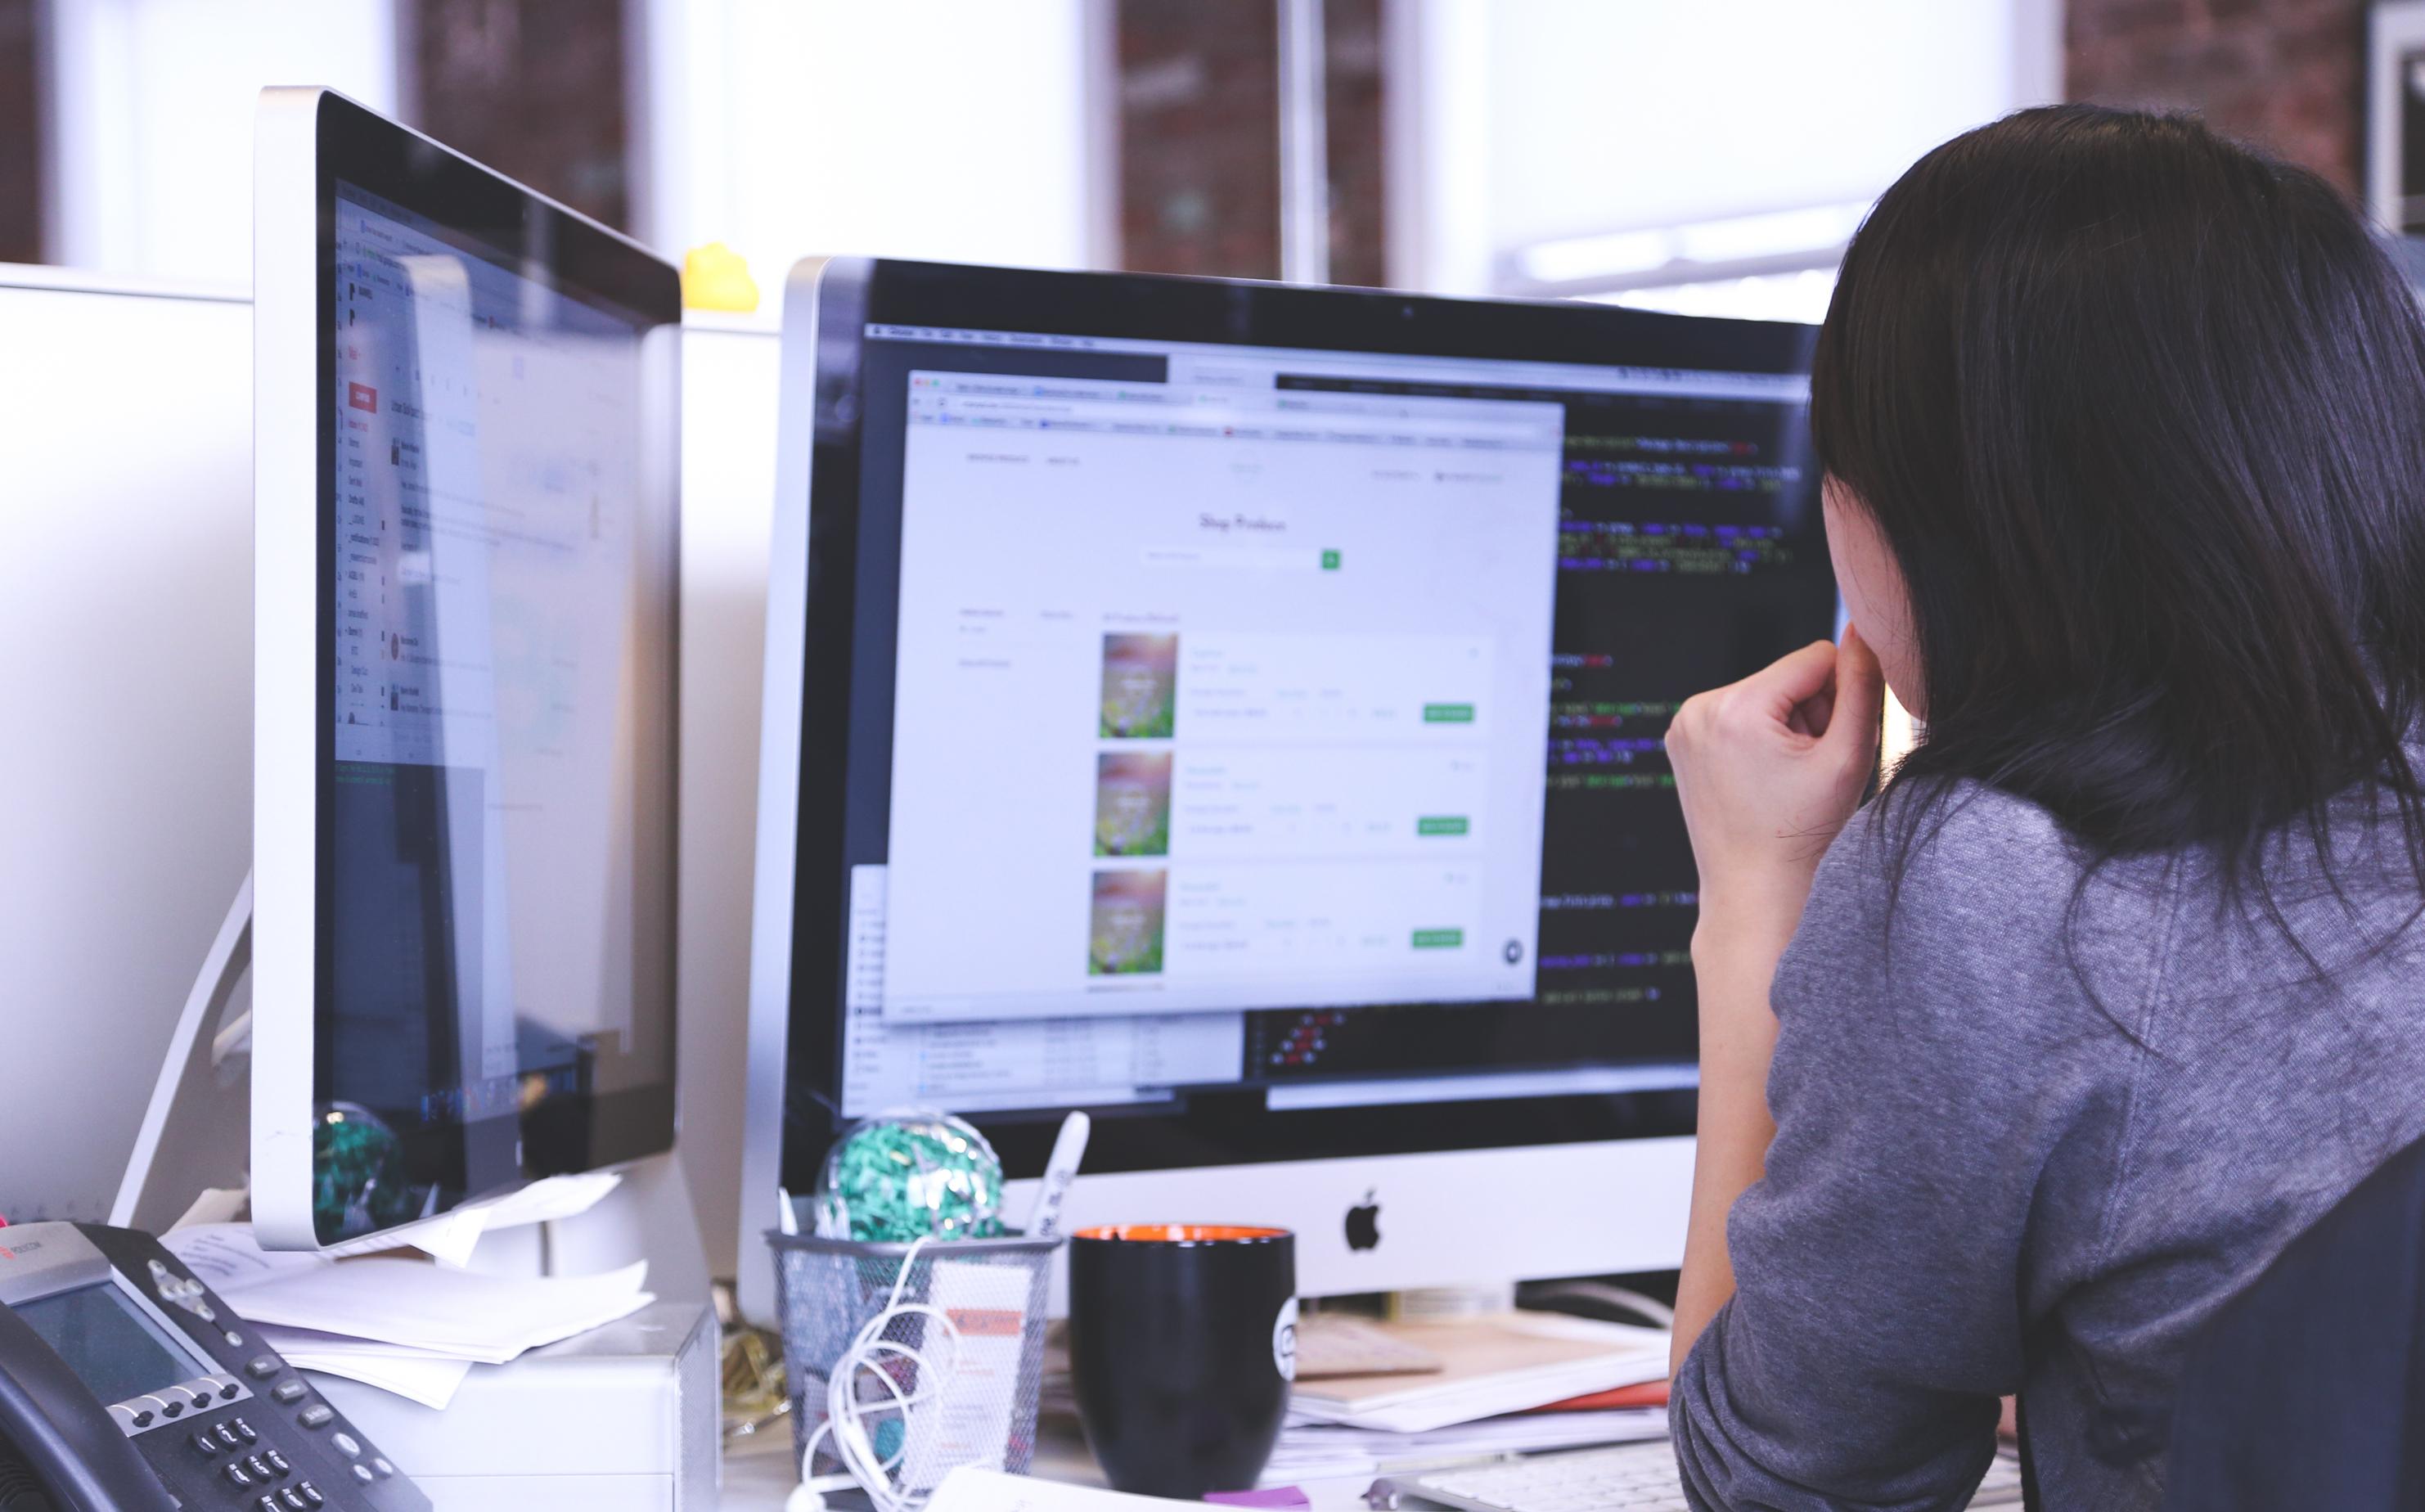 web design services in conroe tx